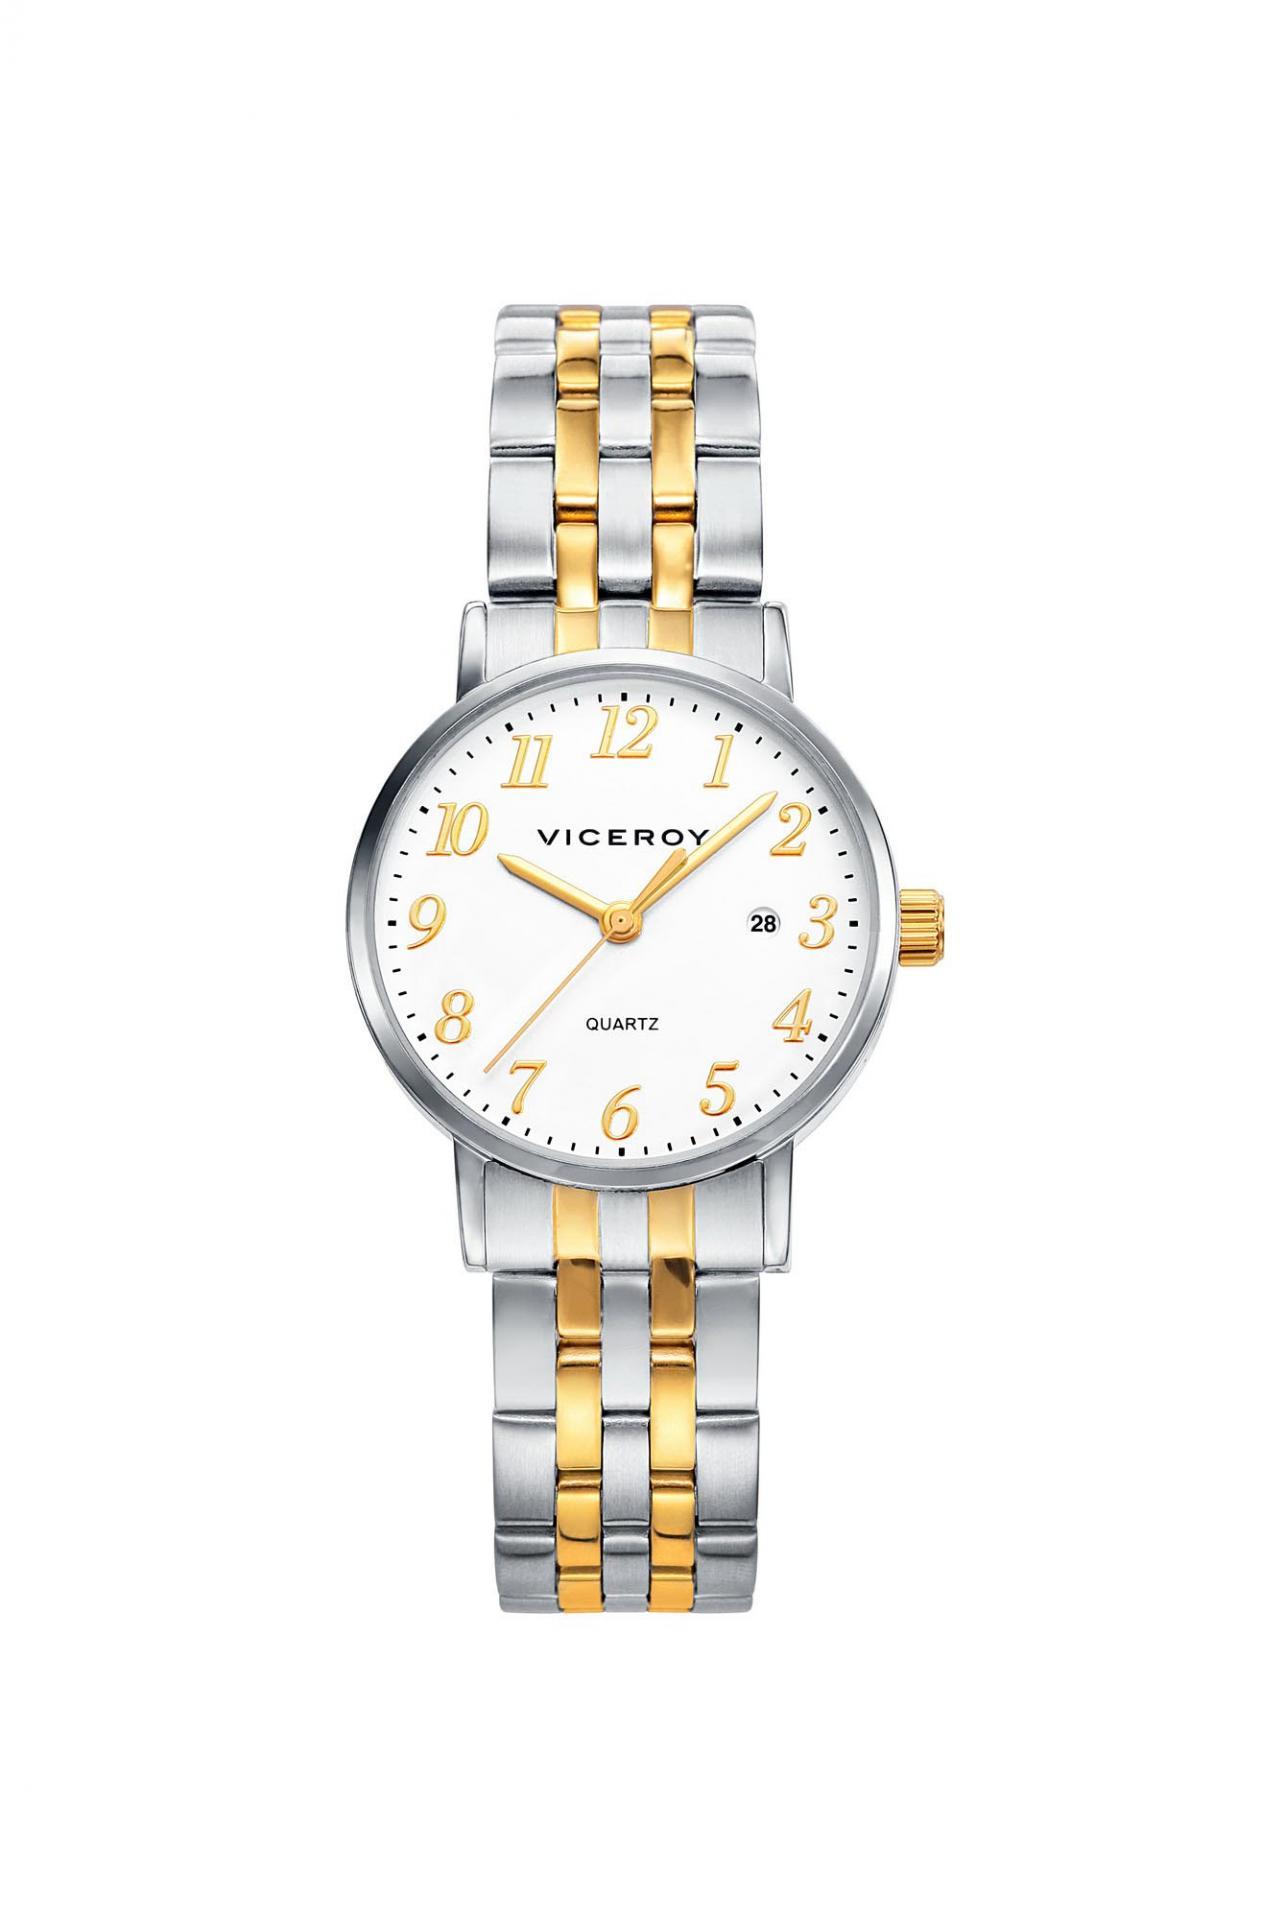 Reloj Viceroy Mujer Ref. 42224-94